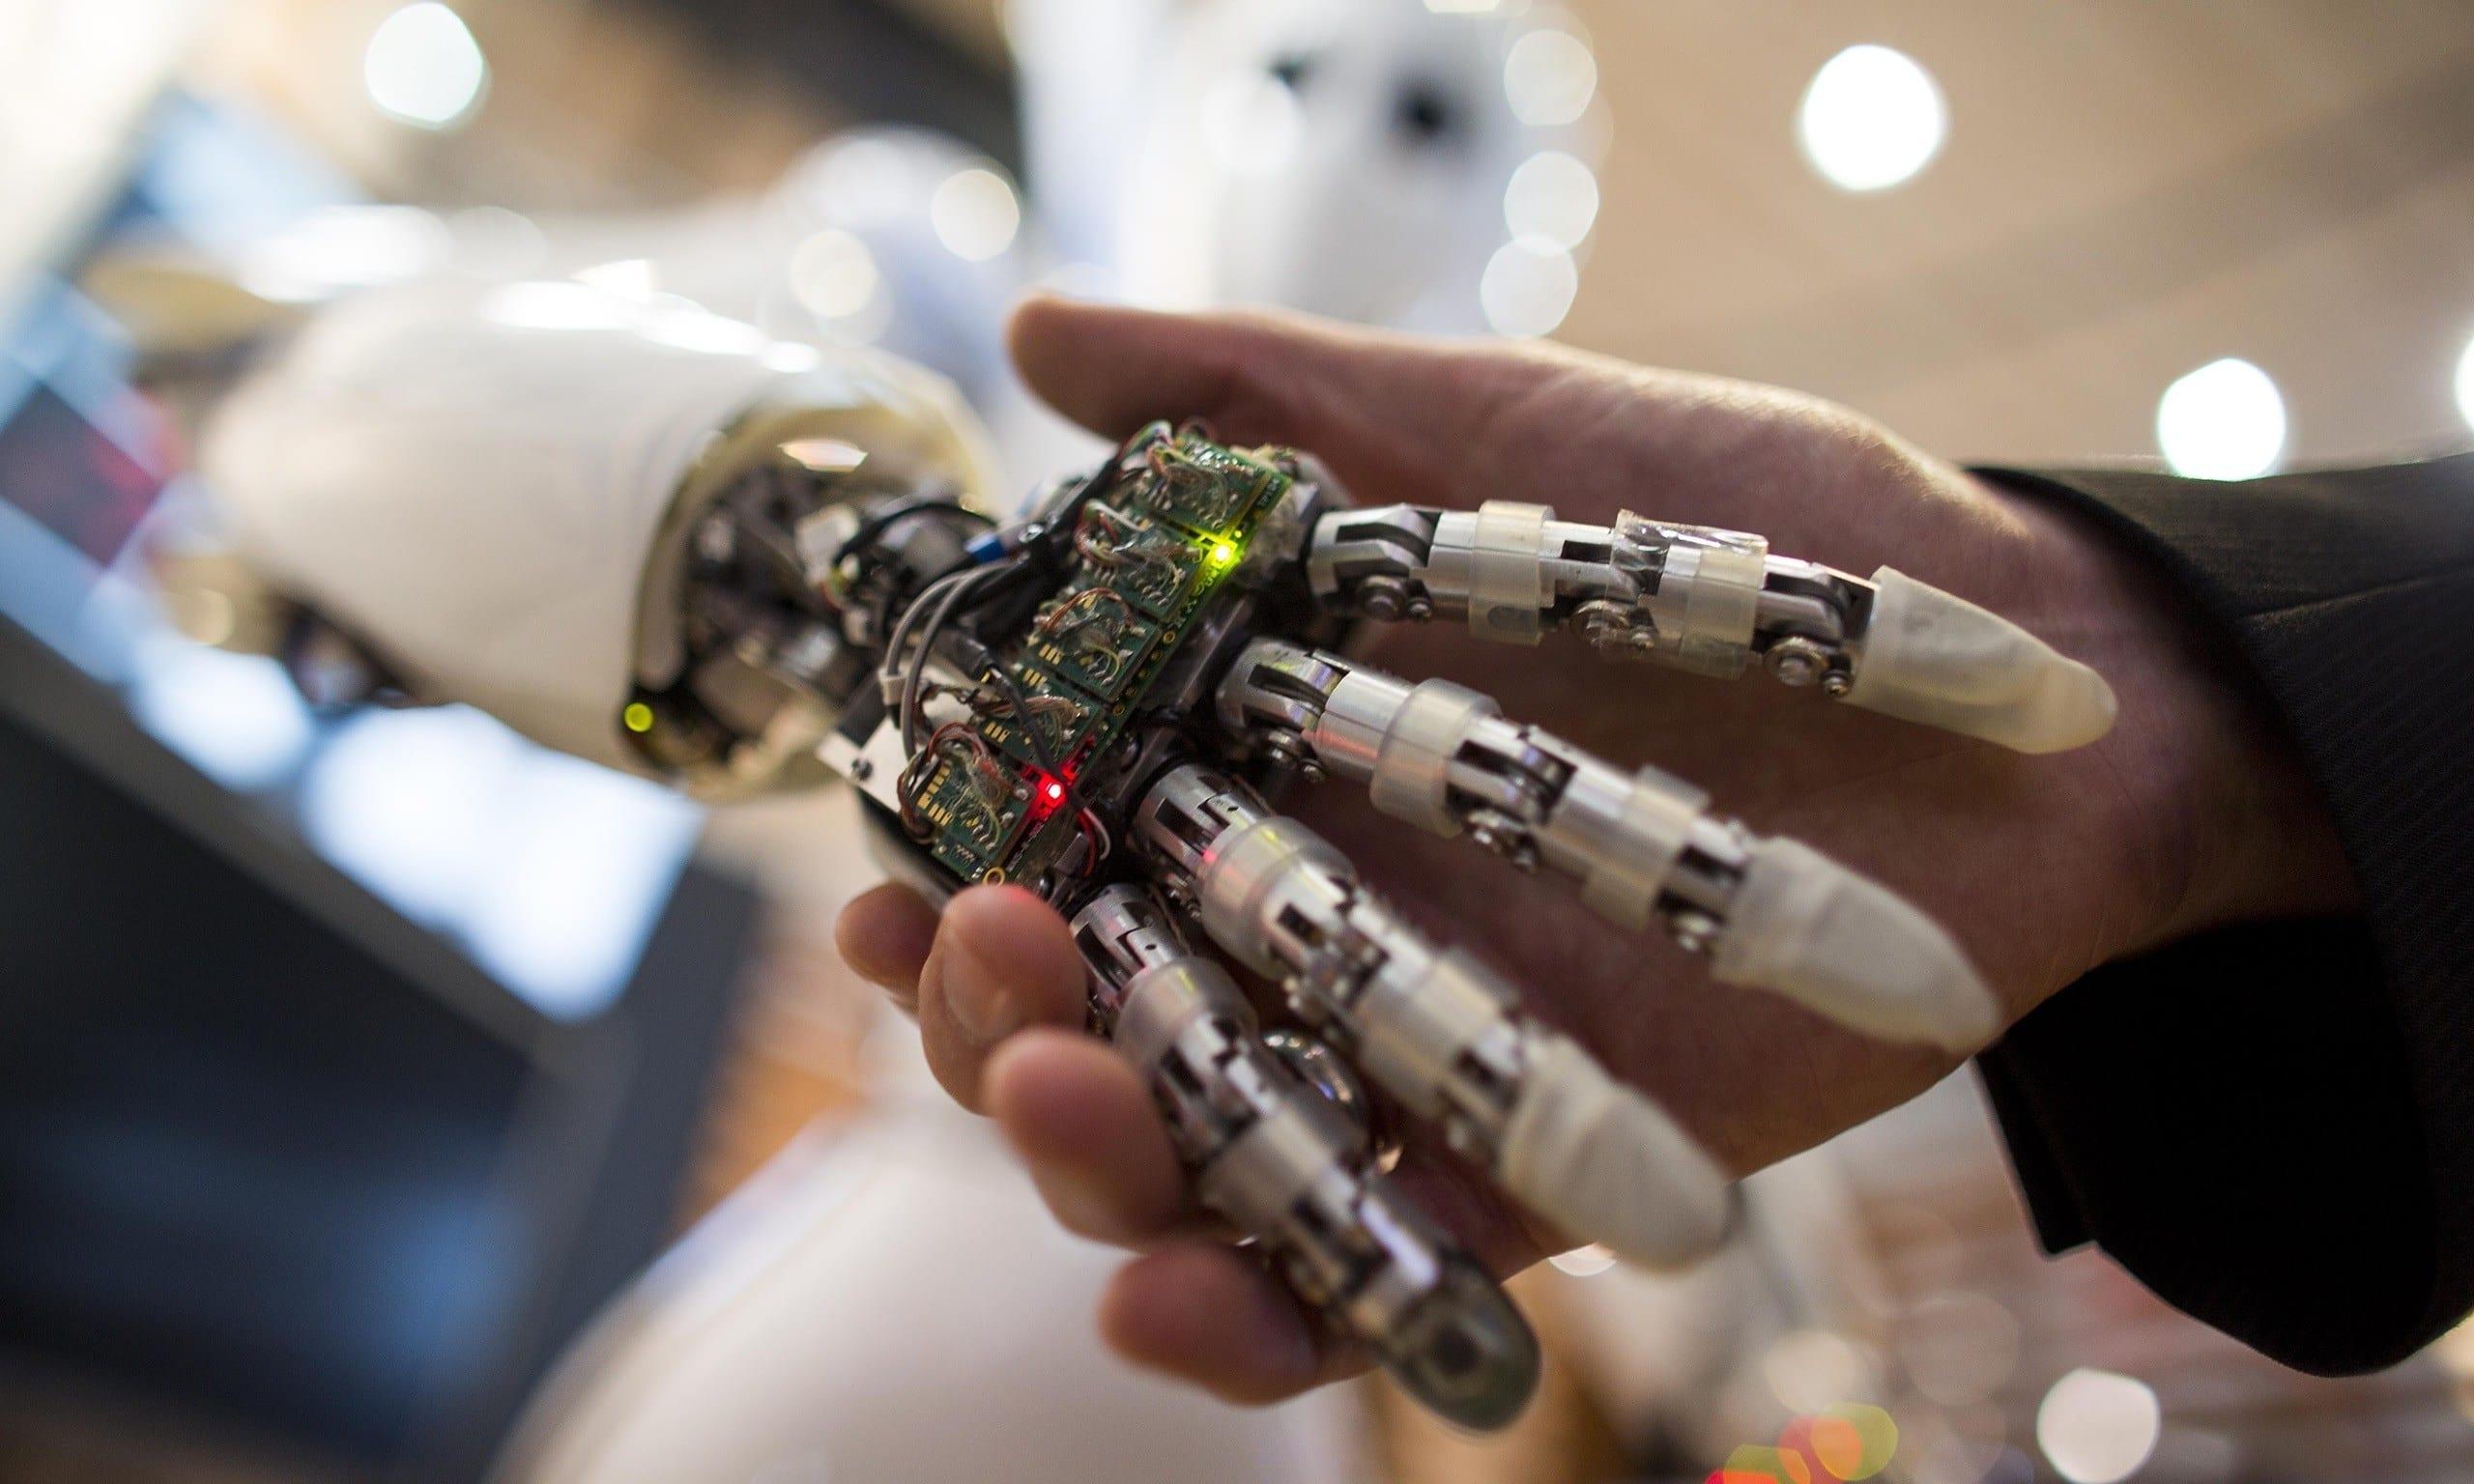 Pc e robot già pensano. Dobbiamo temerli o no?